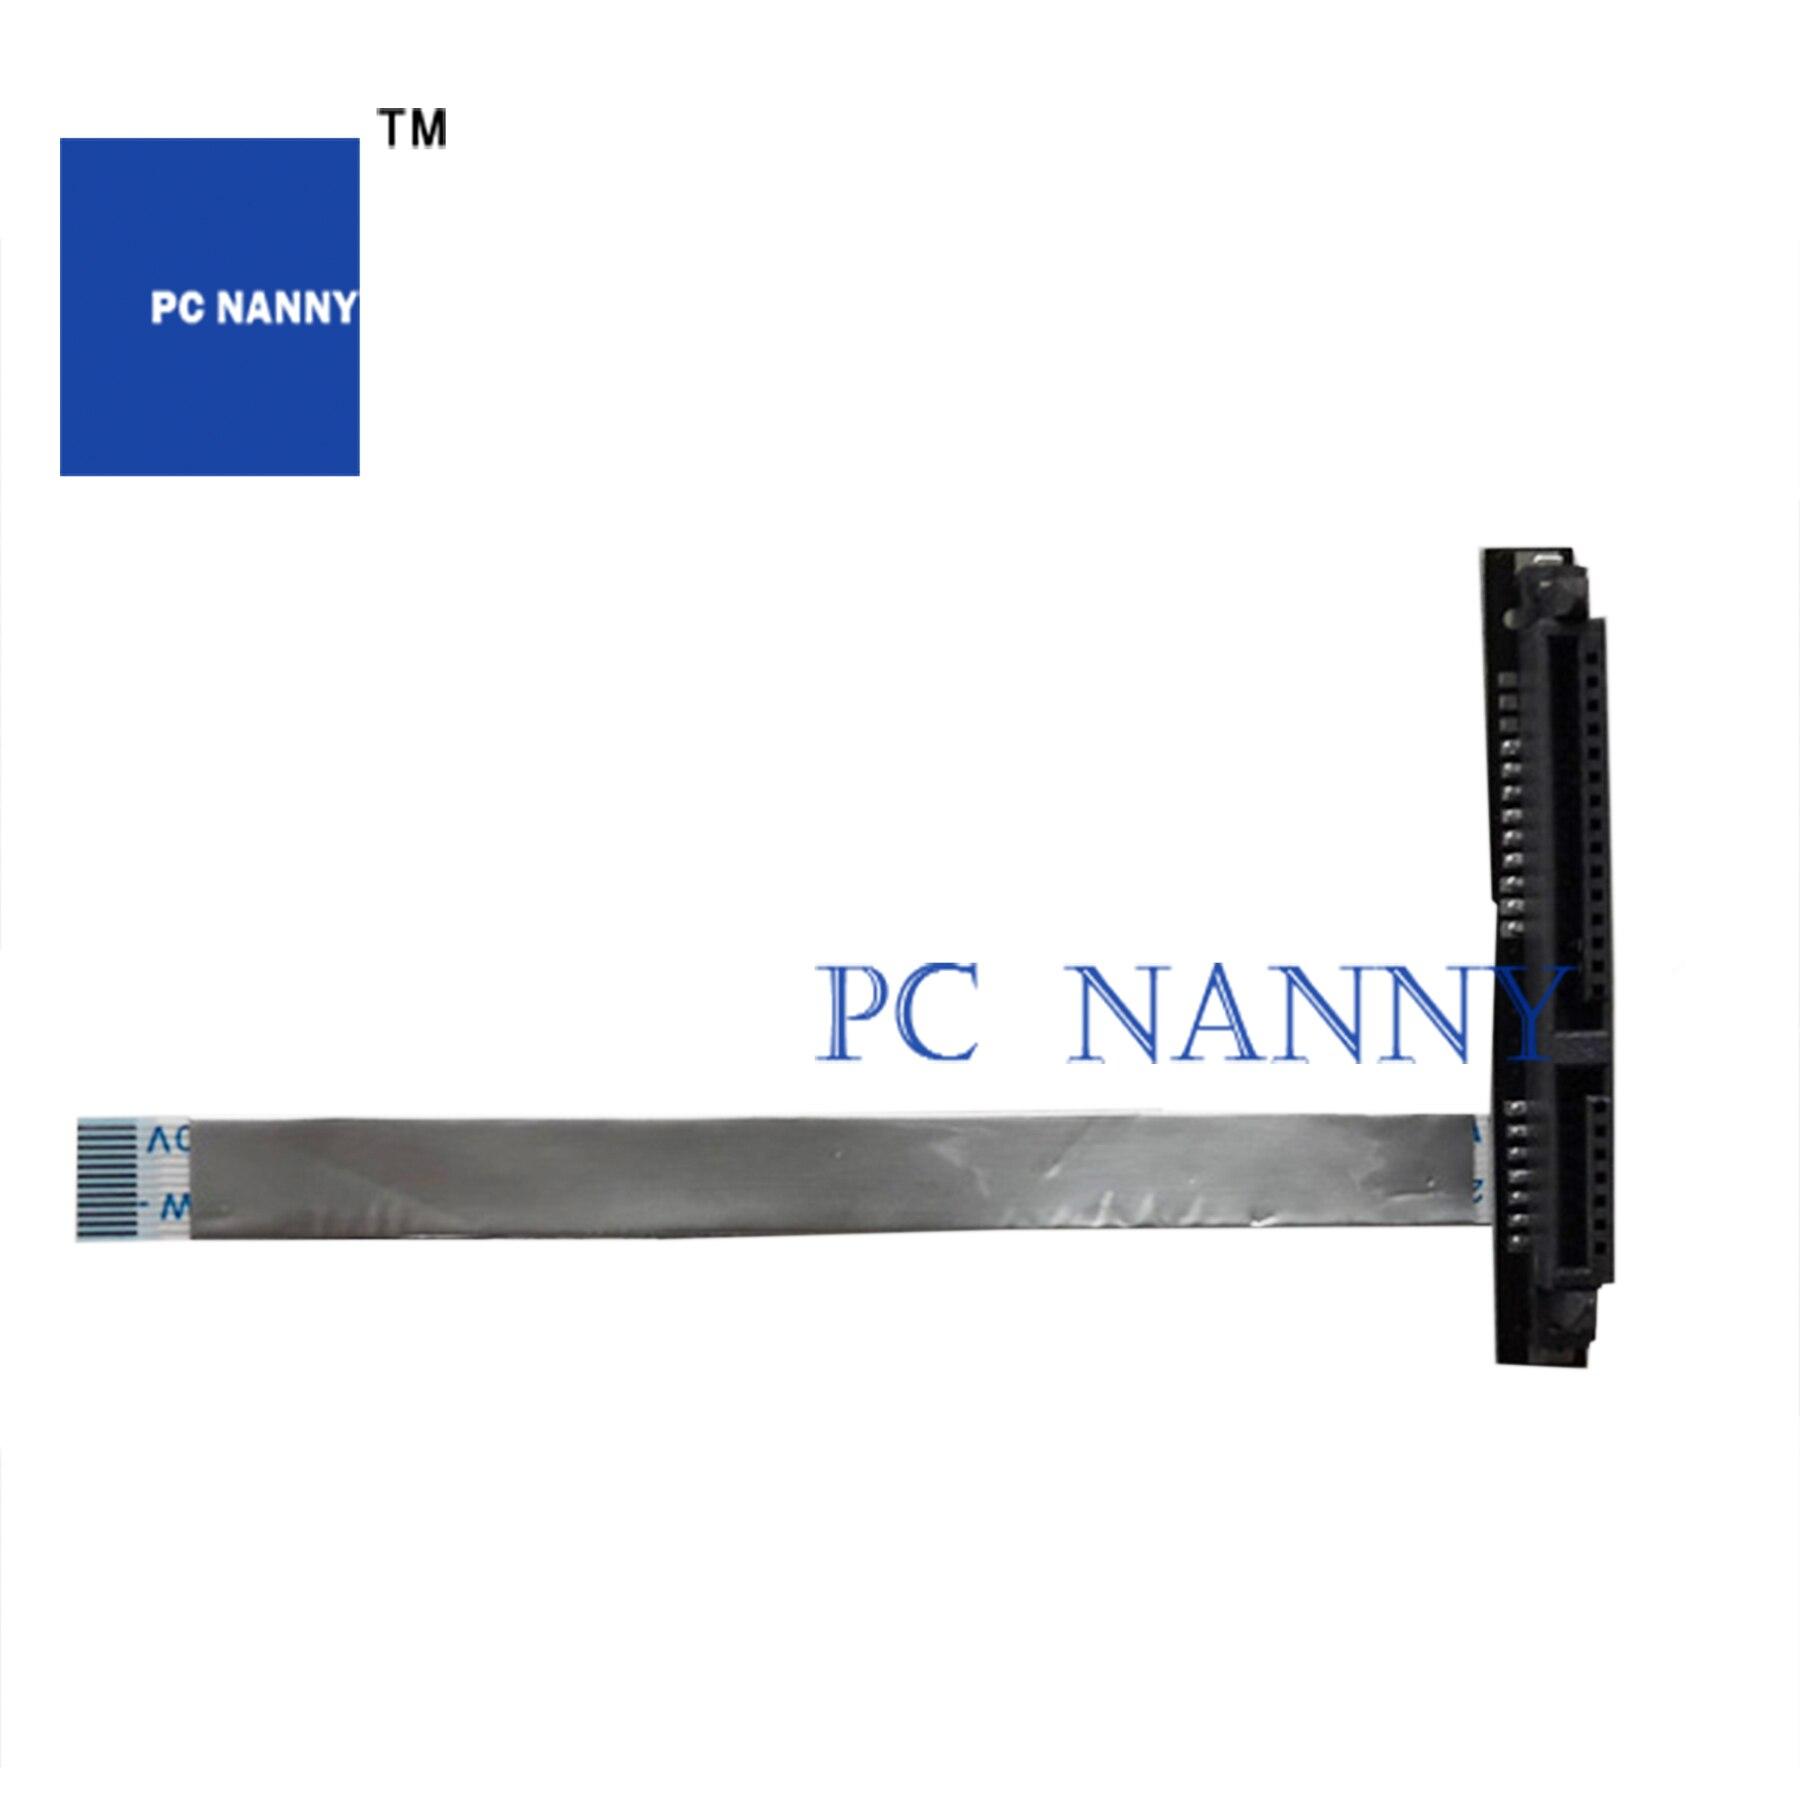 PCNANNY لشركة أيسر Swift3 SF314-41 hdd محرك